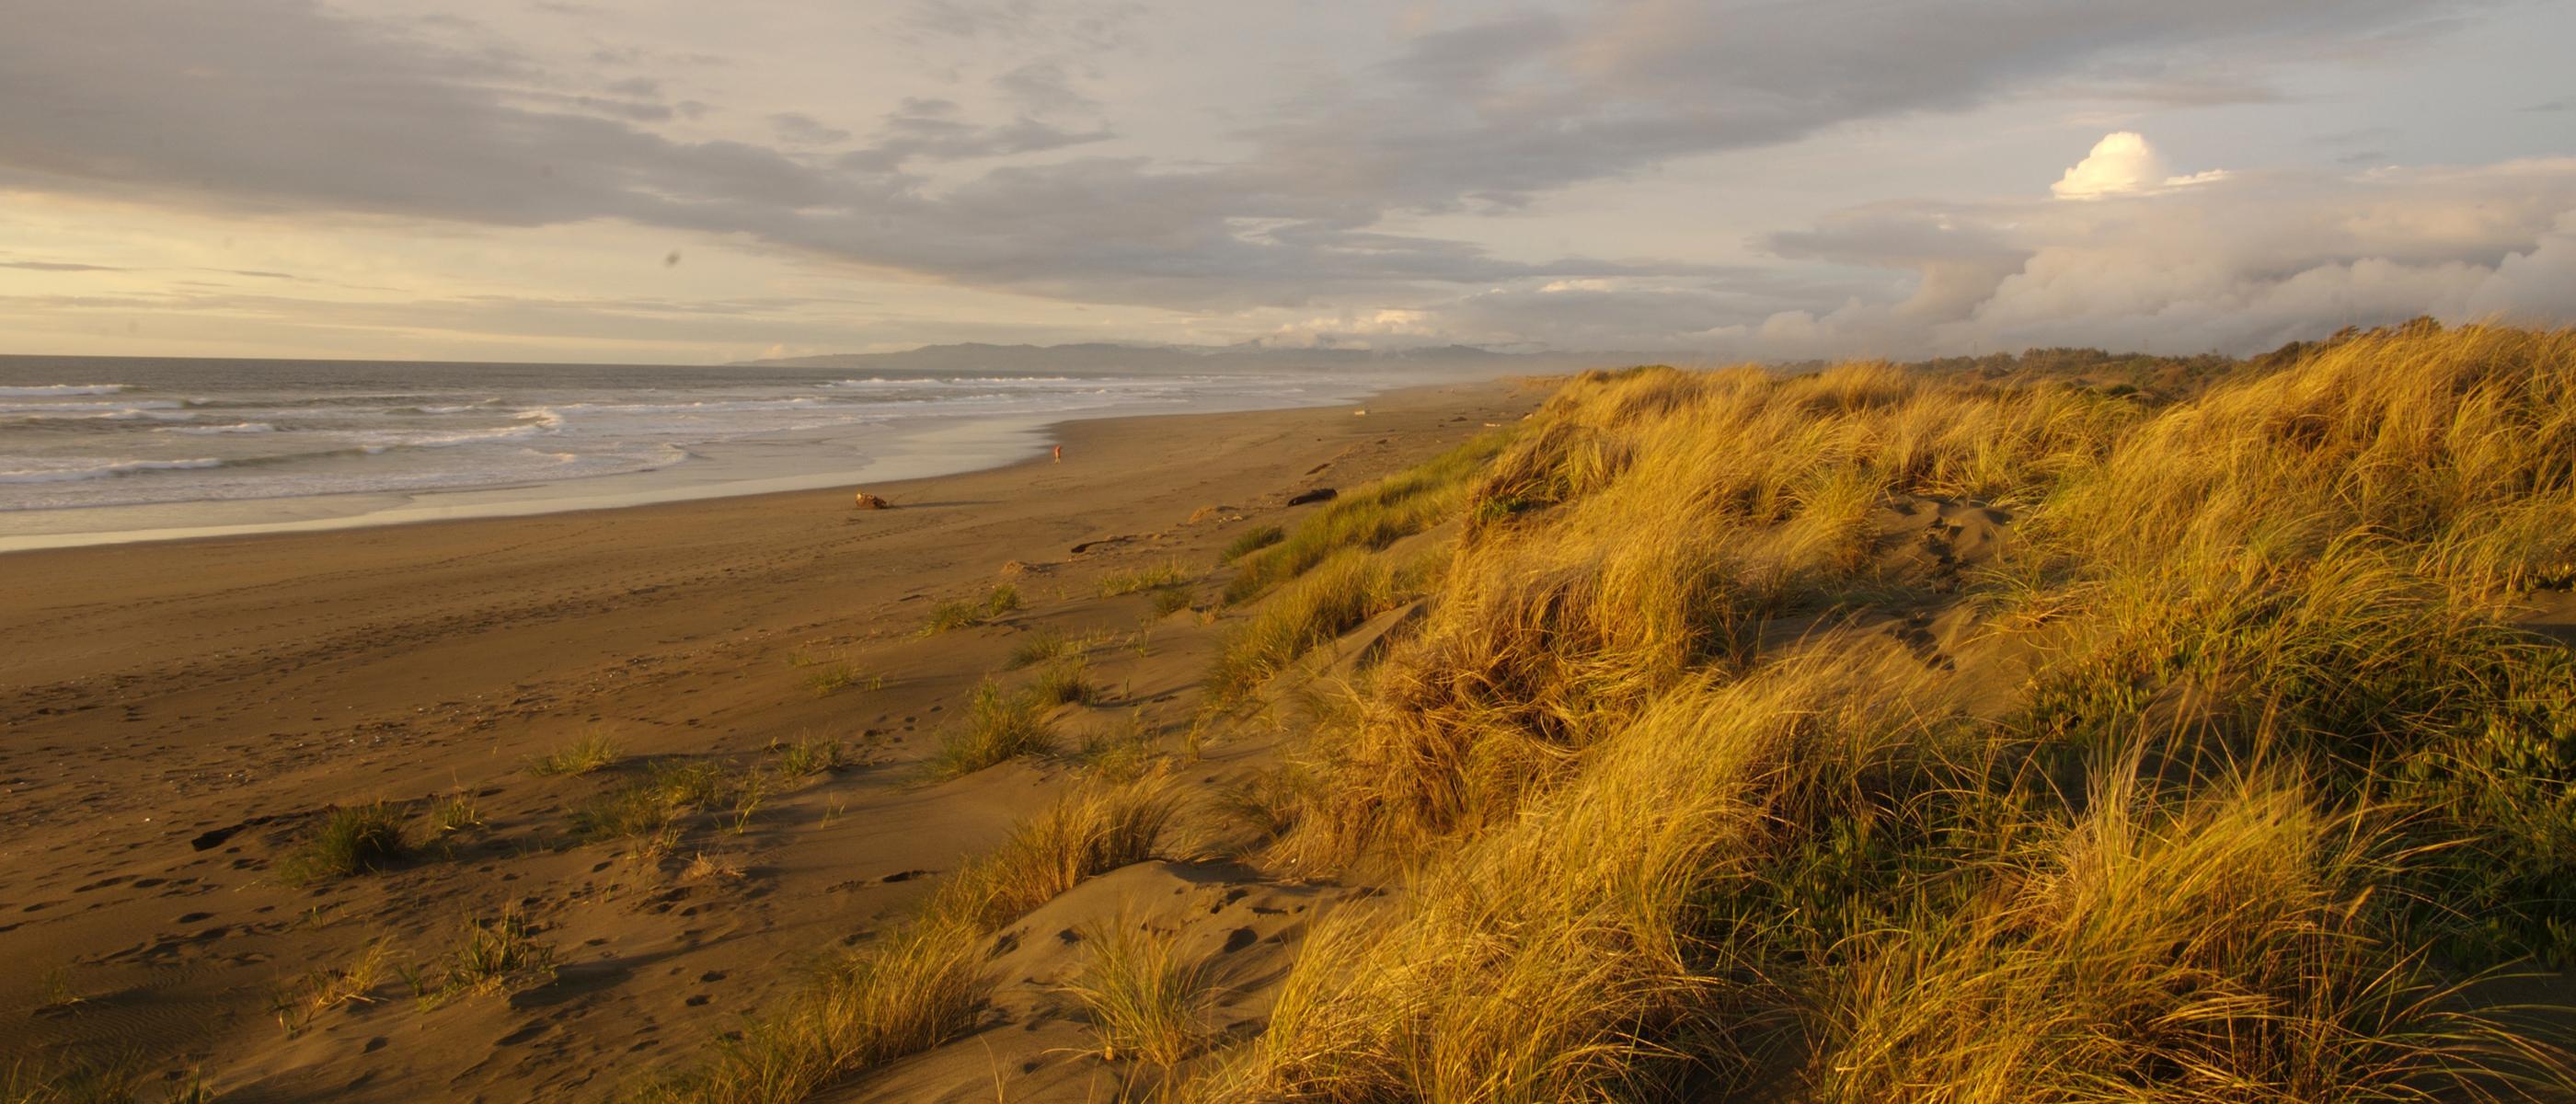 dunes and beach